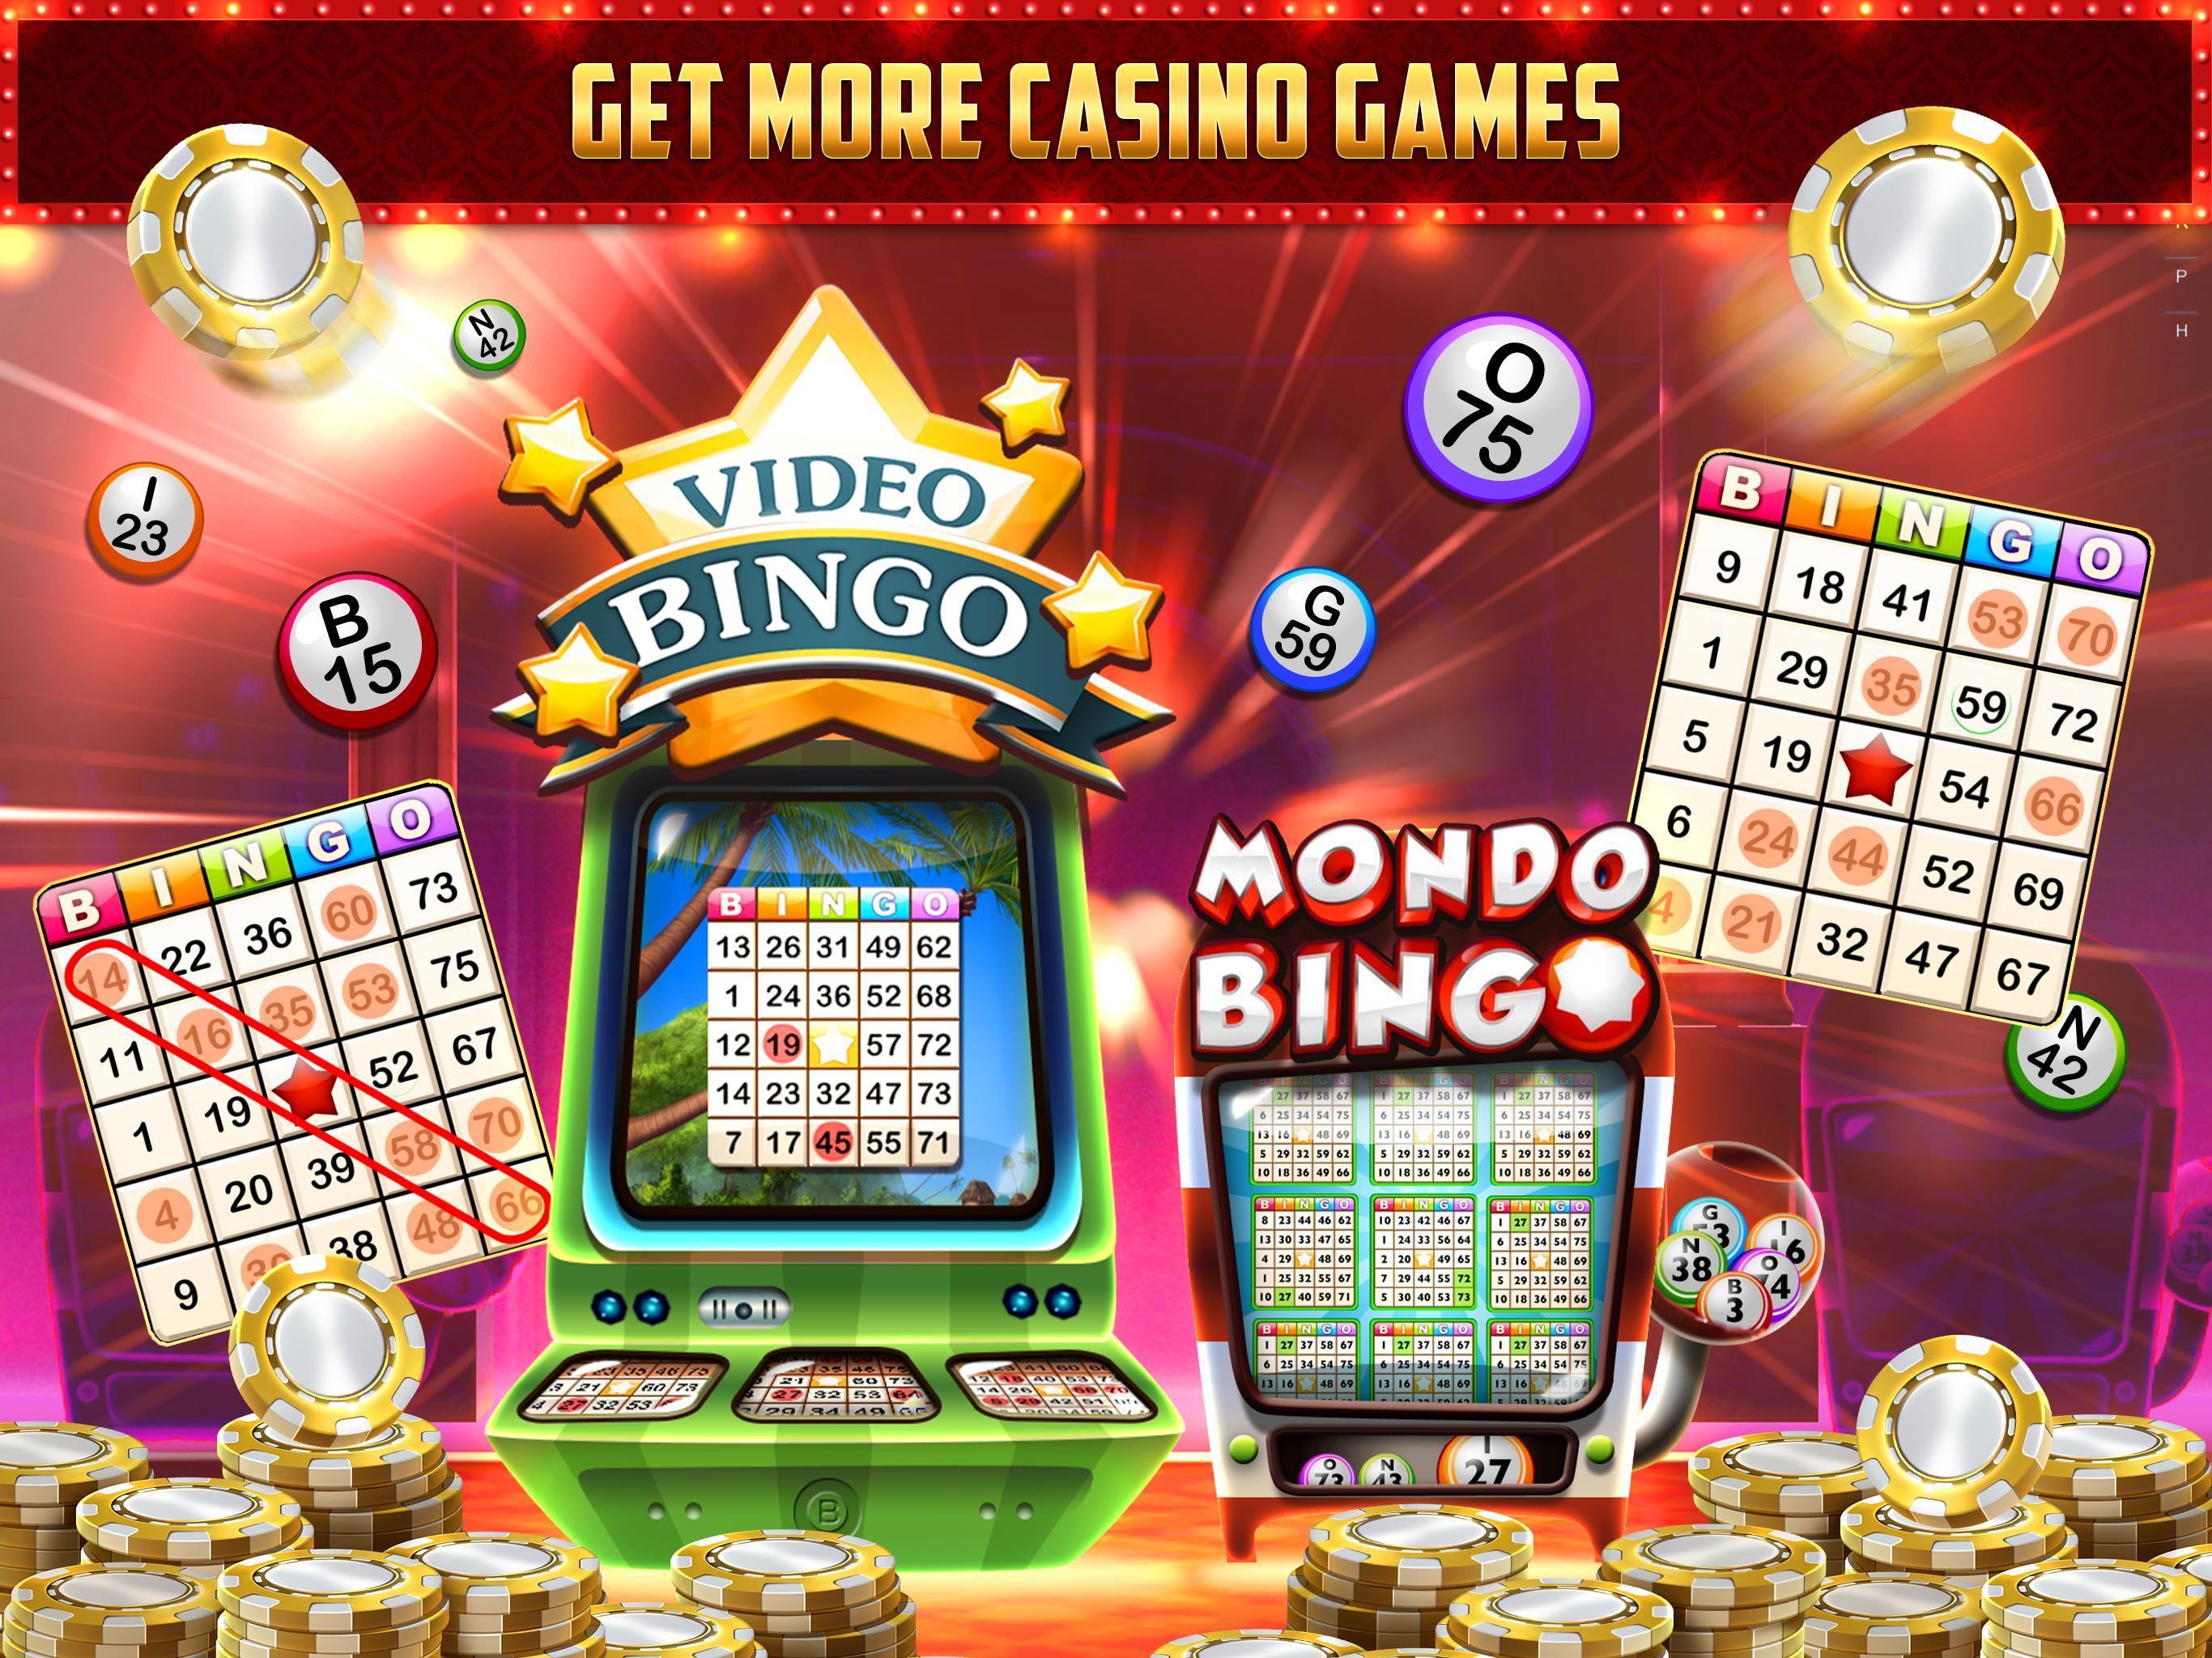 Casinos pocketdice king bingo 32400